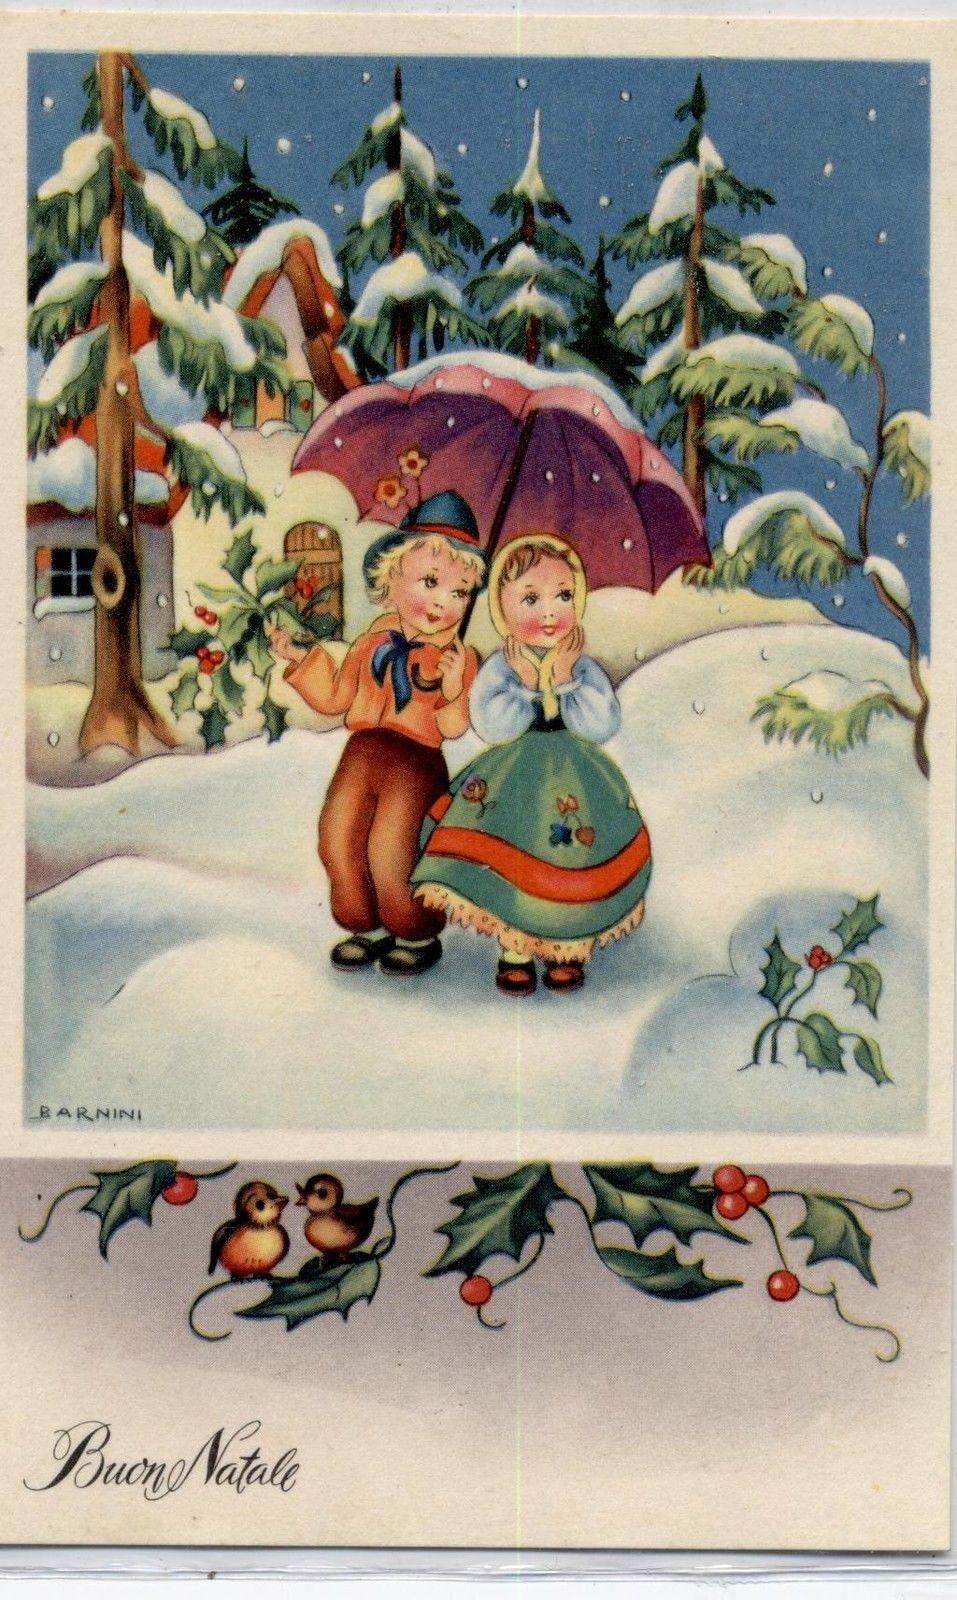 Barnini childrens under umbrella winter landscape snow xmas pc barnini childrens under umbrella winter landscape snow xmas pc circa 1940 c christmas postcards vintage christmas cards kristyandbryce Images